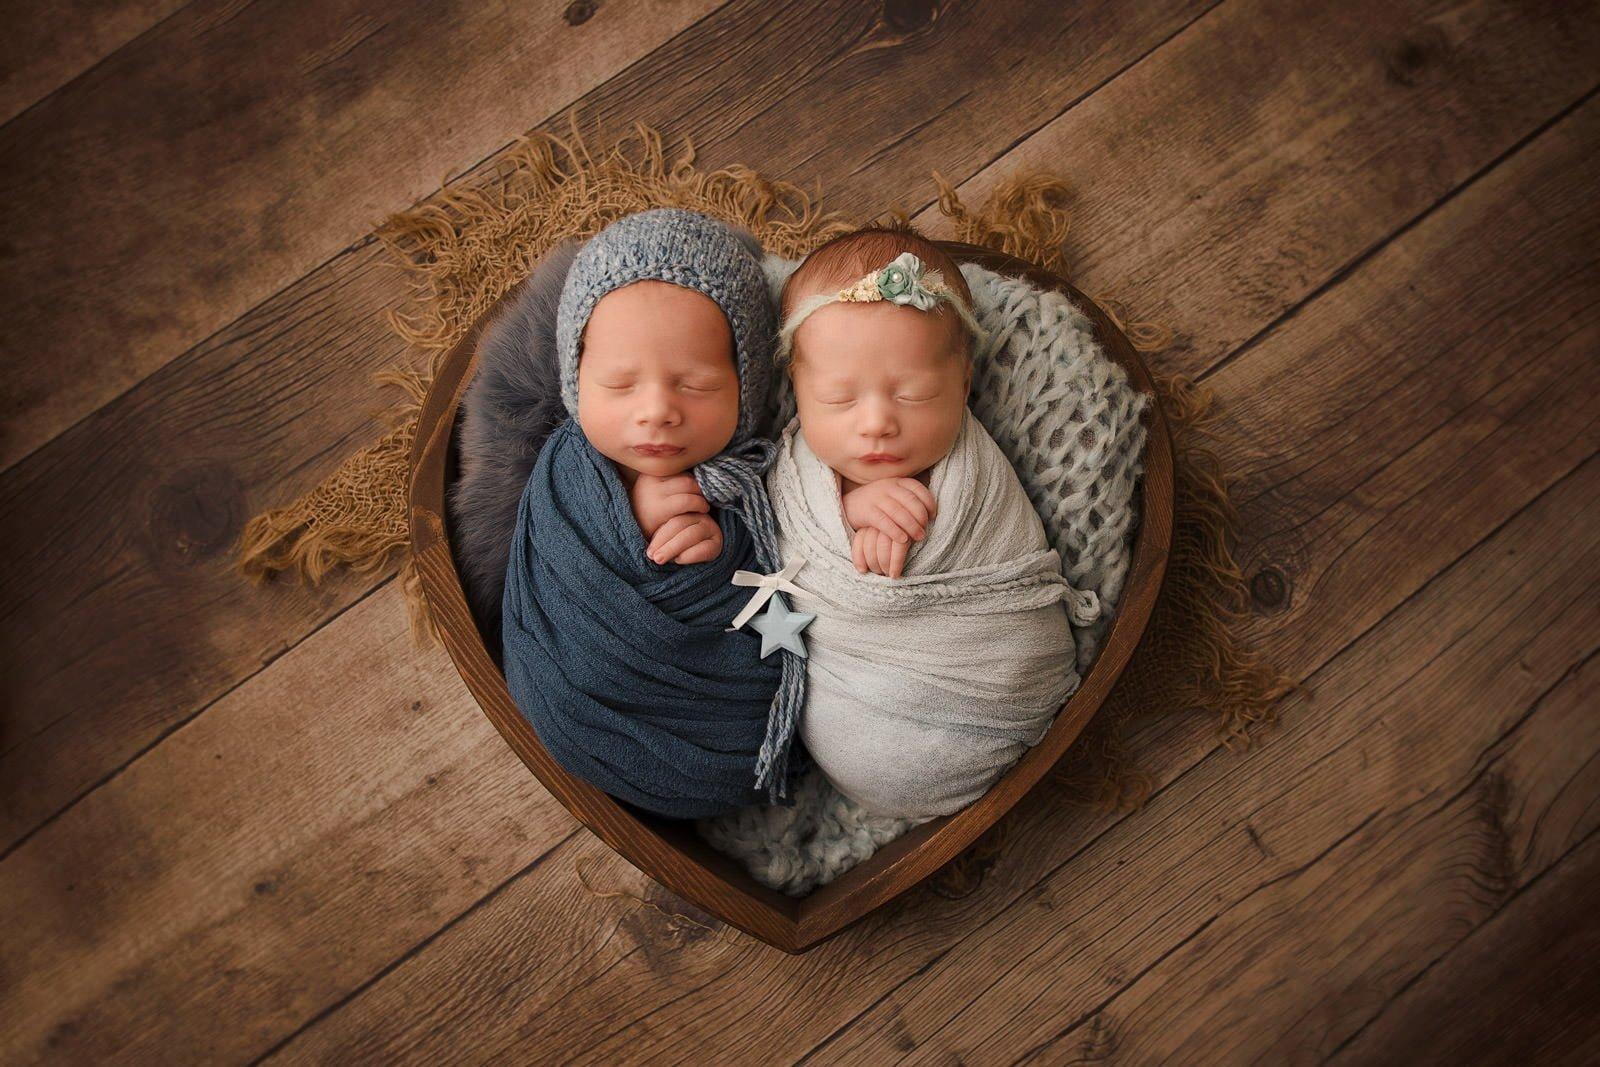 Adorable Newborn Rainbow Twins 7